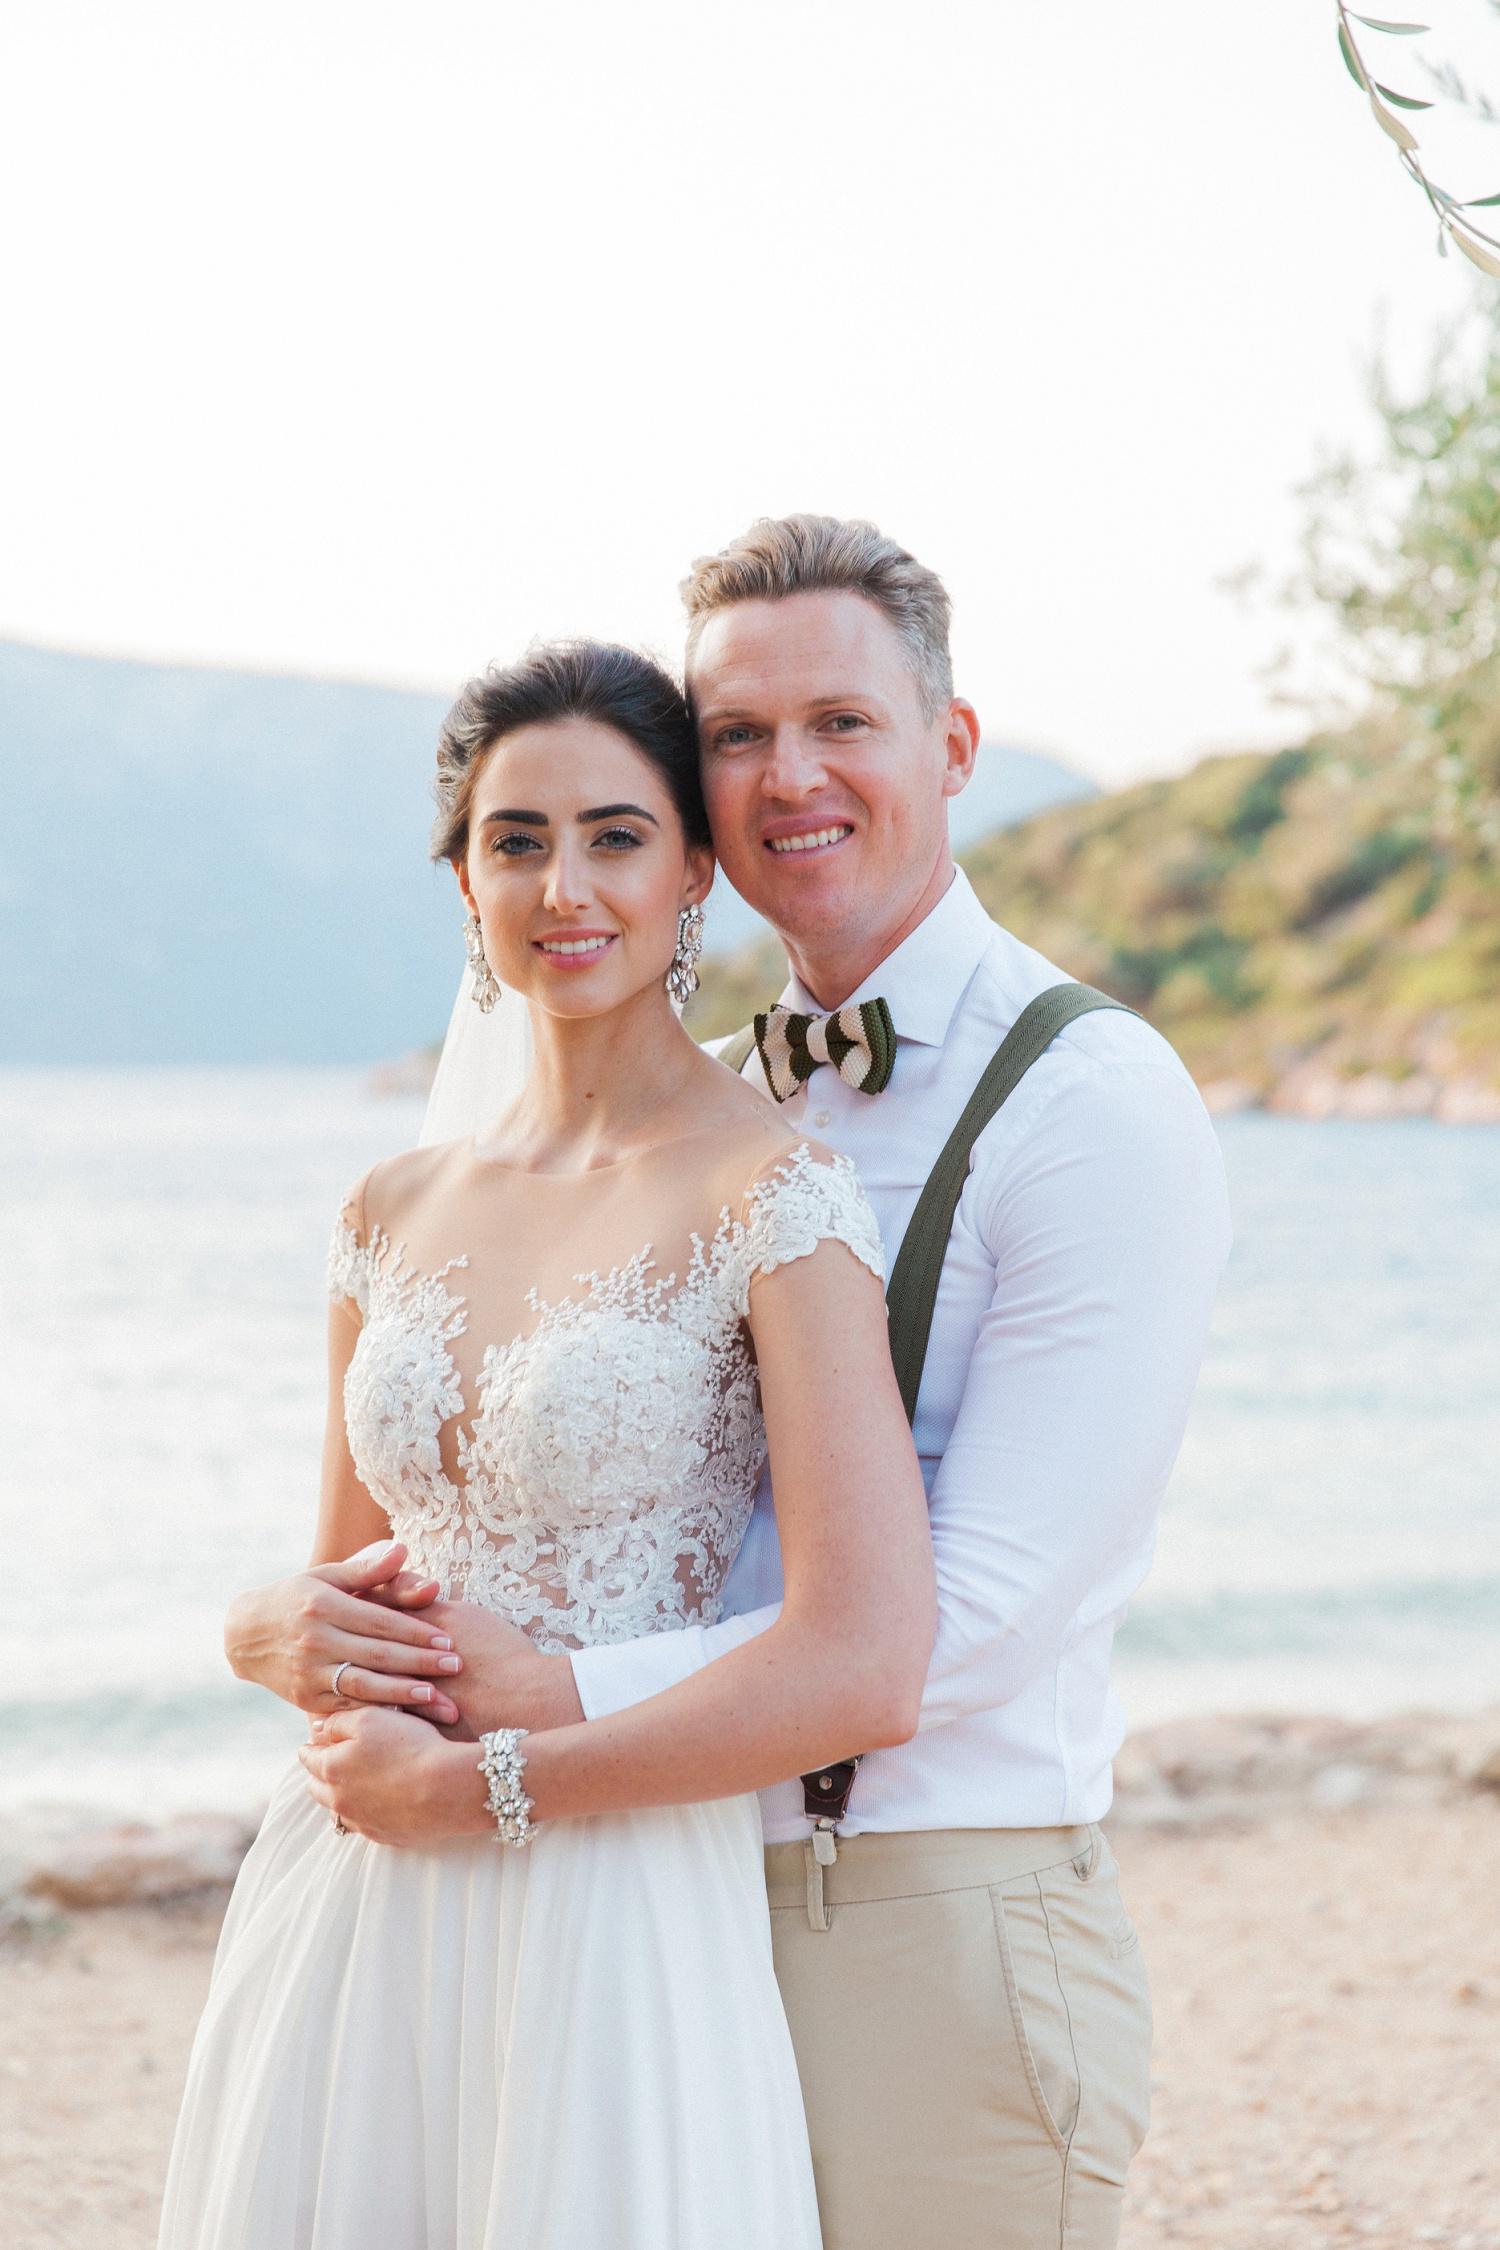 Ithaca wedding photographer testimonial